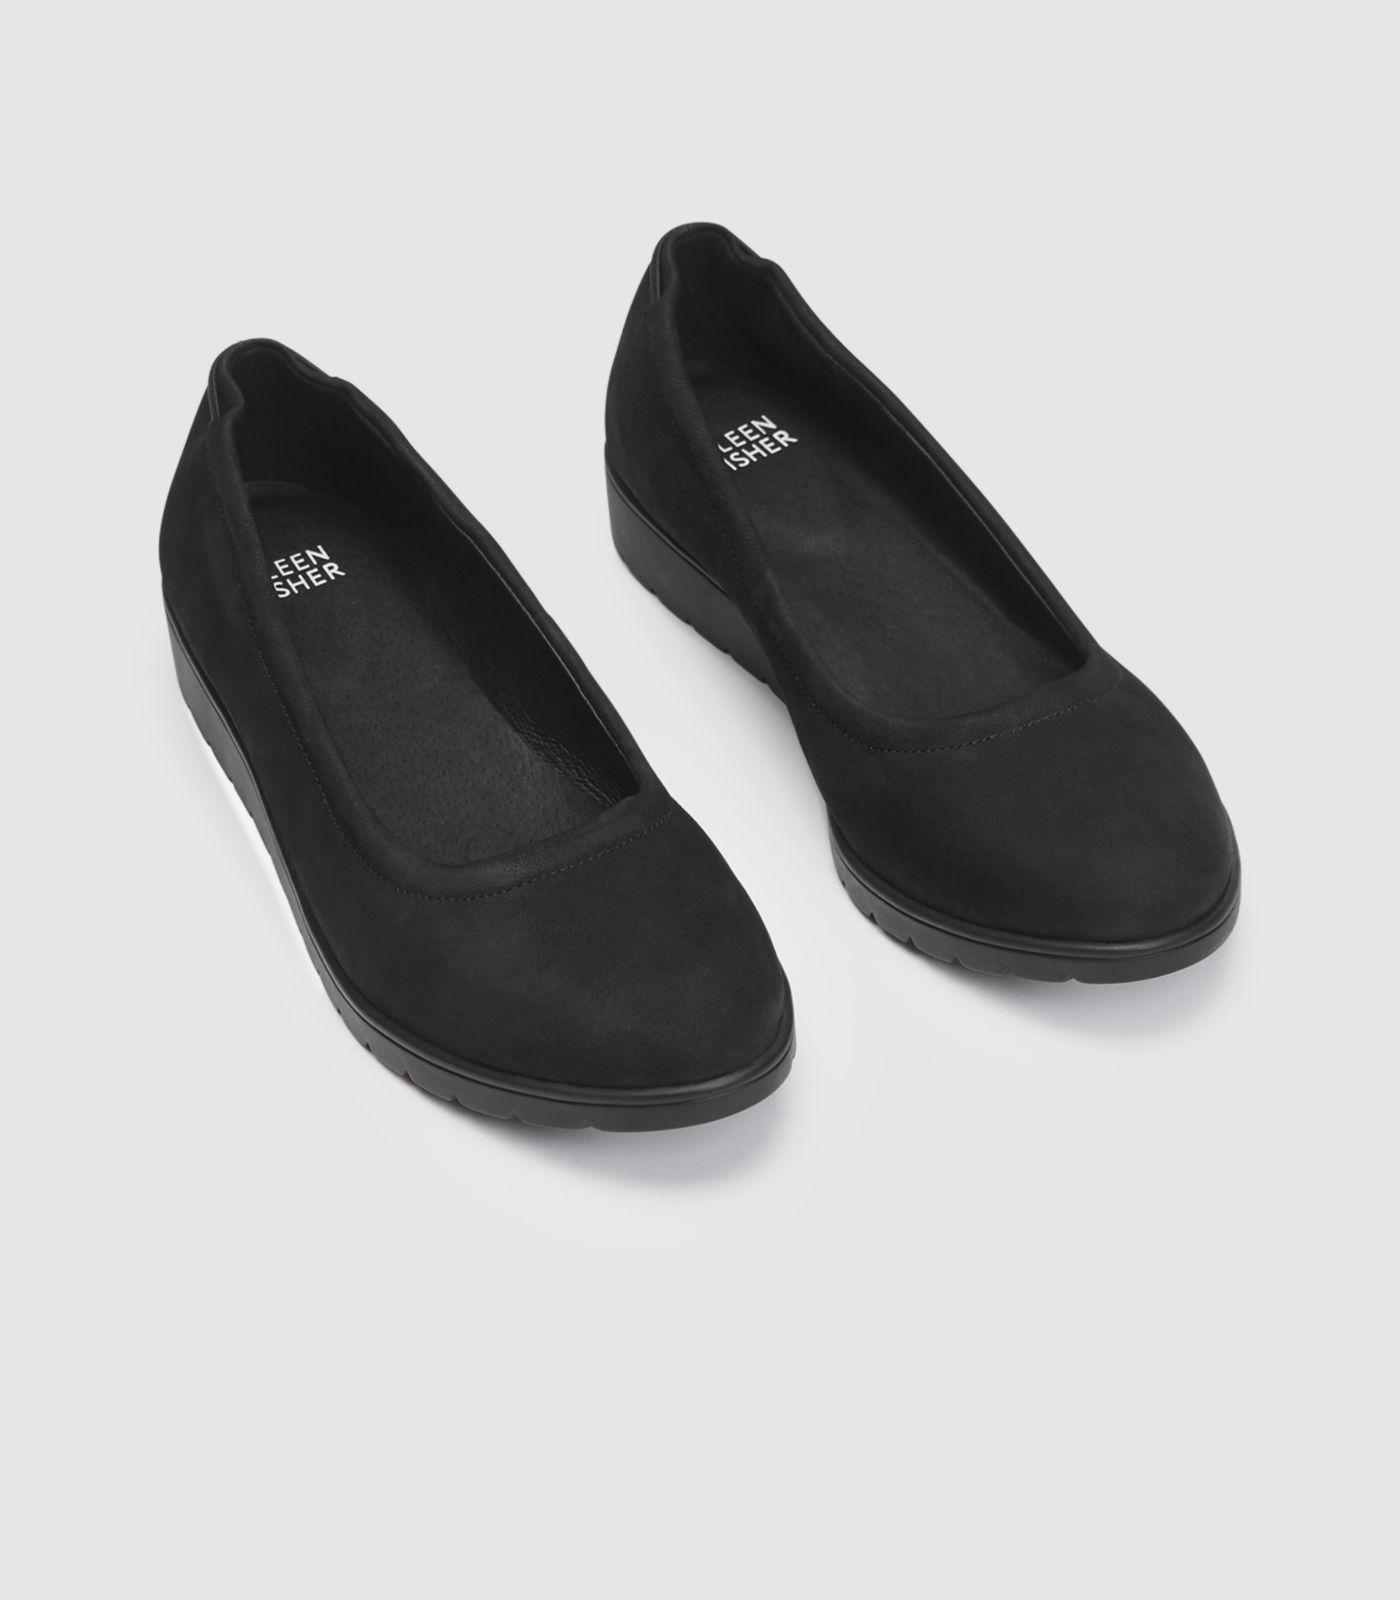 aae590b35c0 Eileen Fisher - Black Honest Nubuck Ballet Wedge - Lyst. View fullscreen